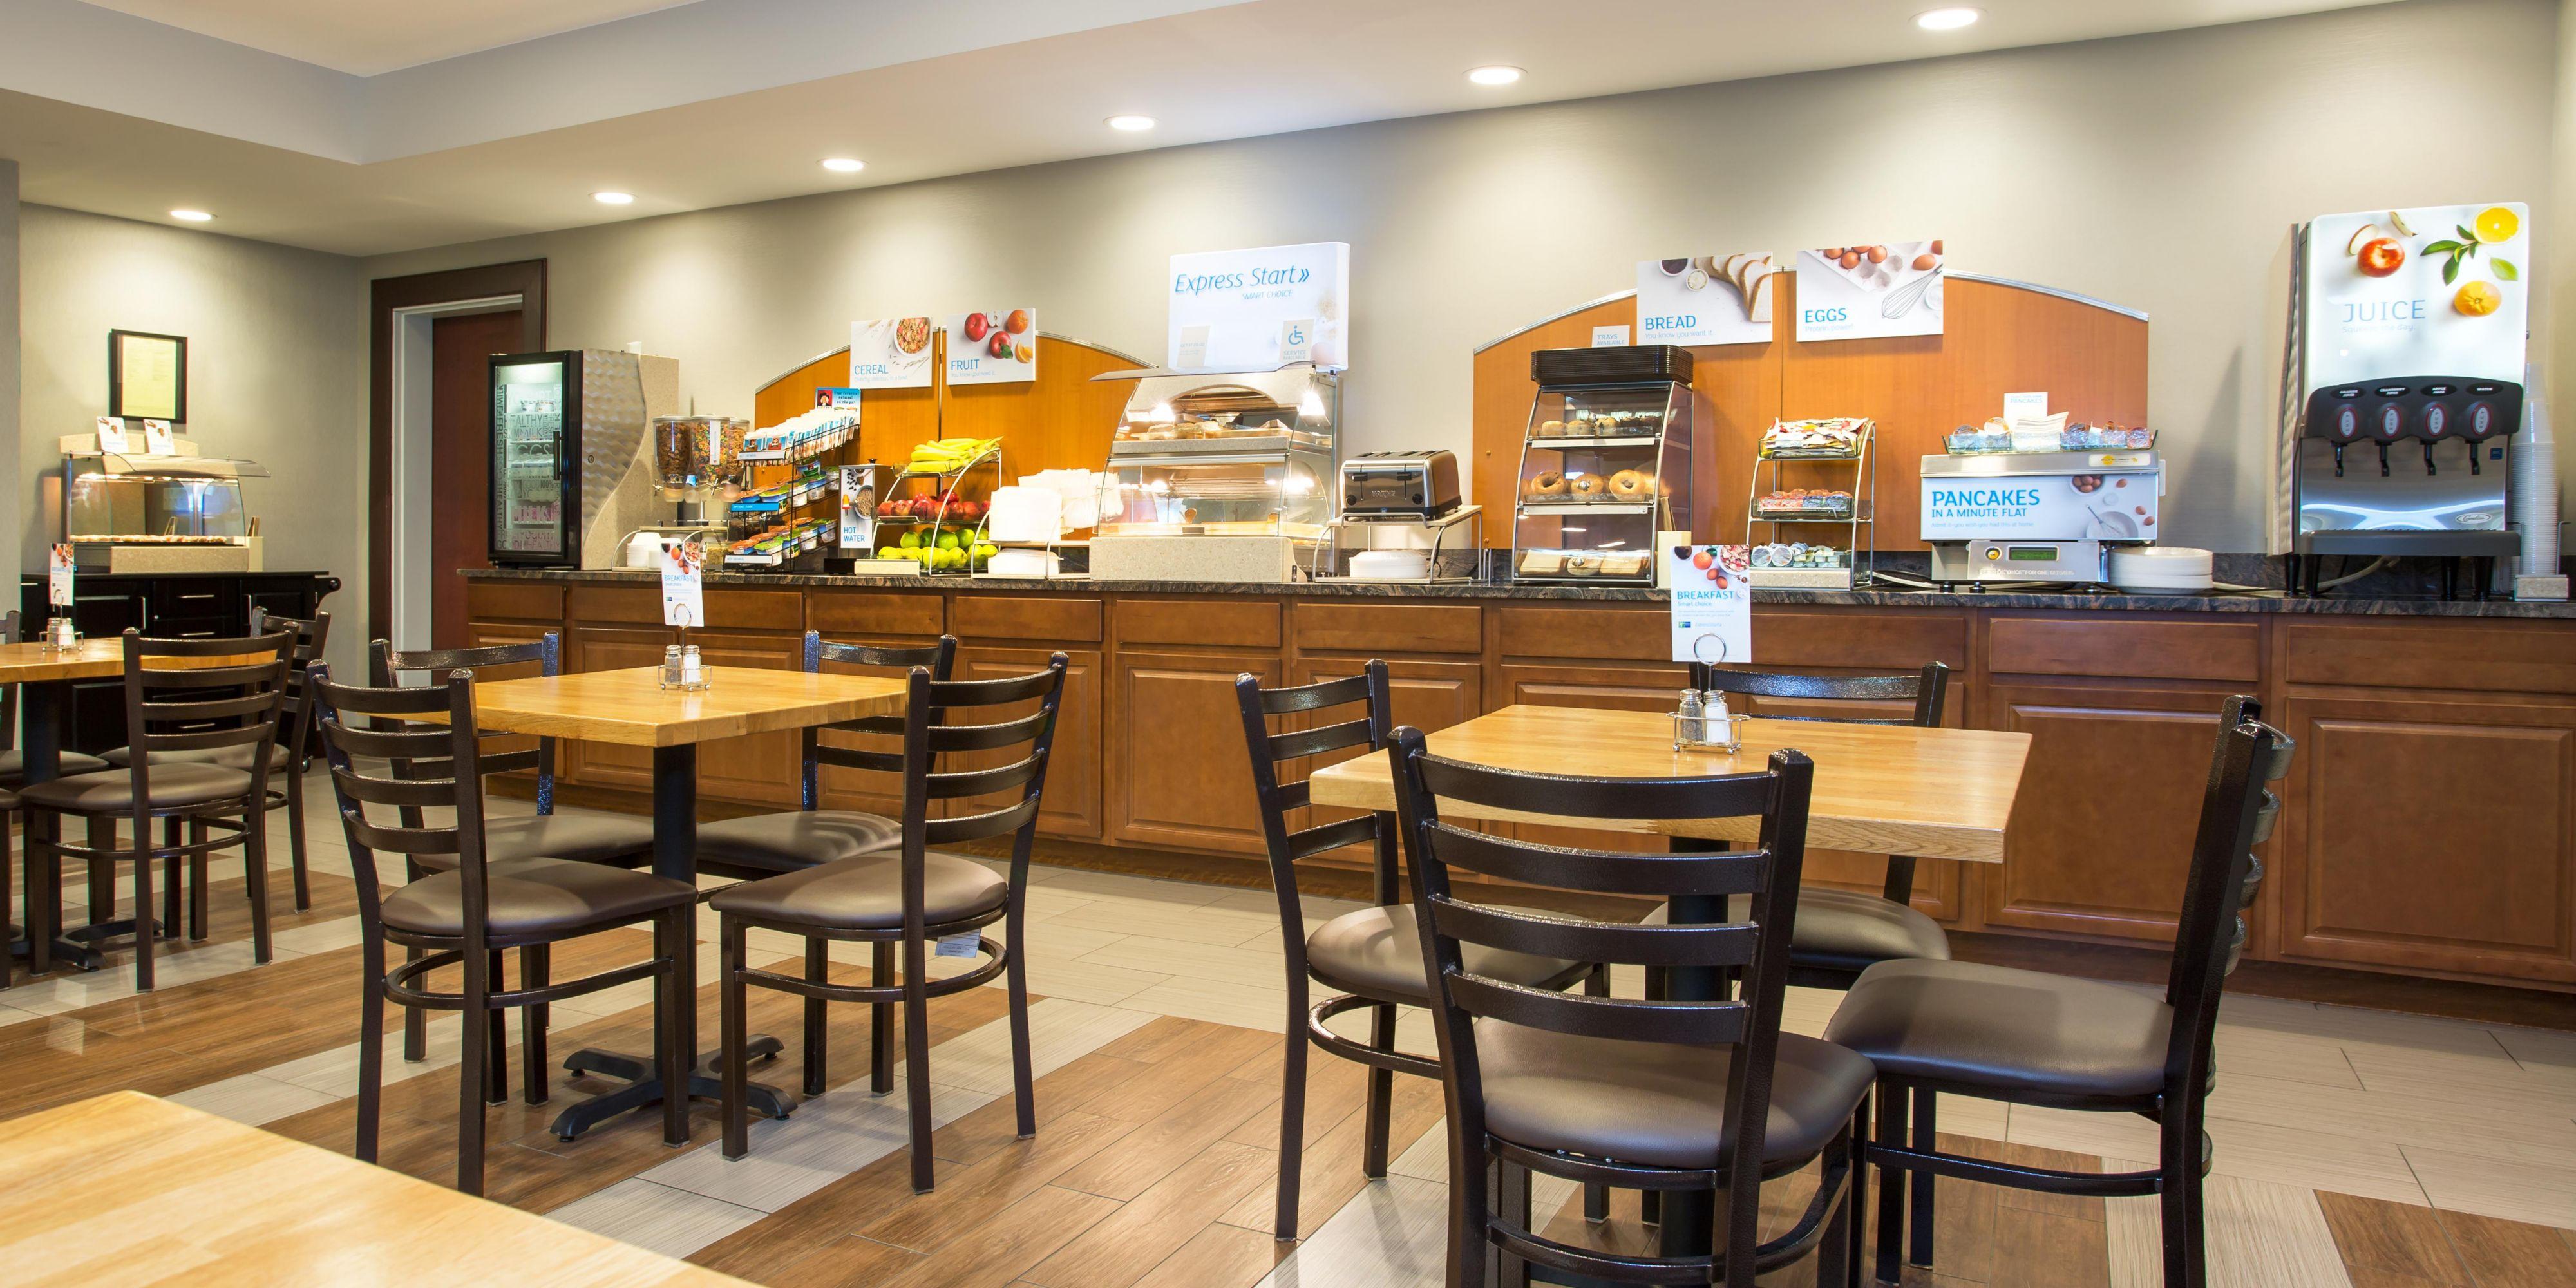 Holiday Inn Express Nicholasville 4030224193 2x1